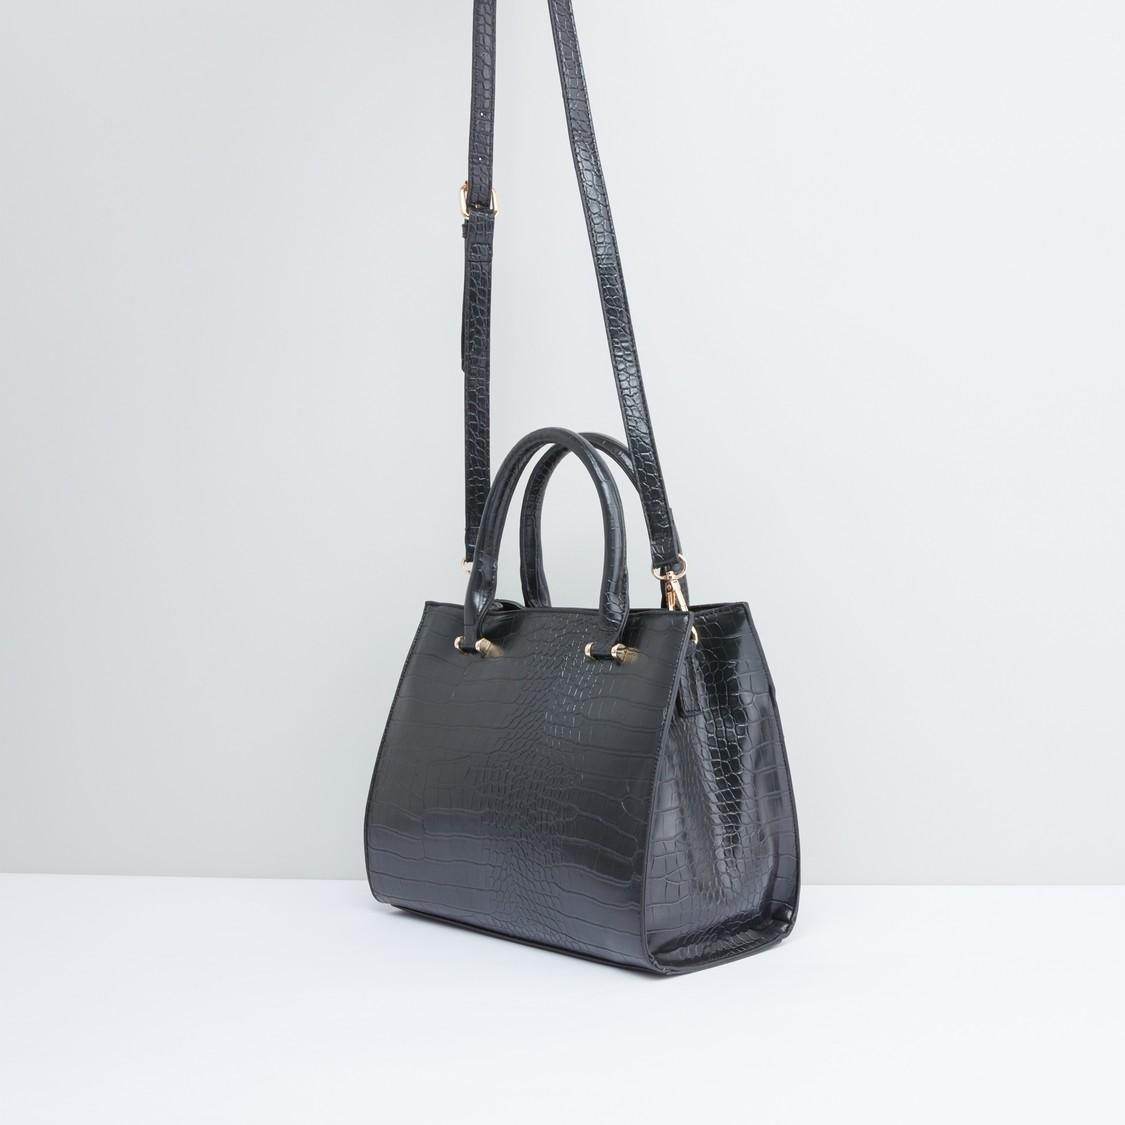 Textured Handbag with Zip Closure and Adjustable Shoulder Strap